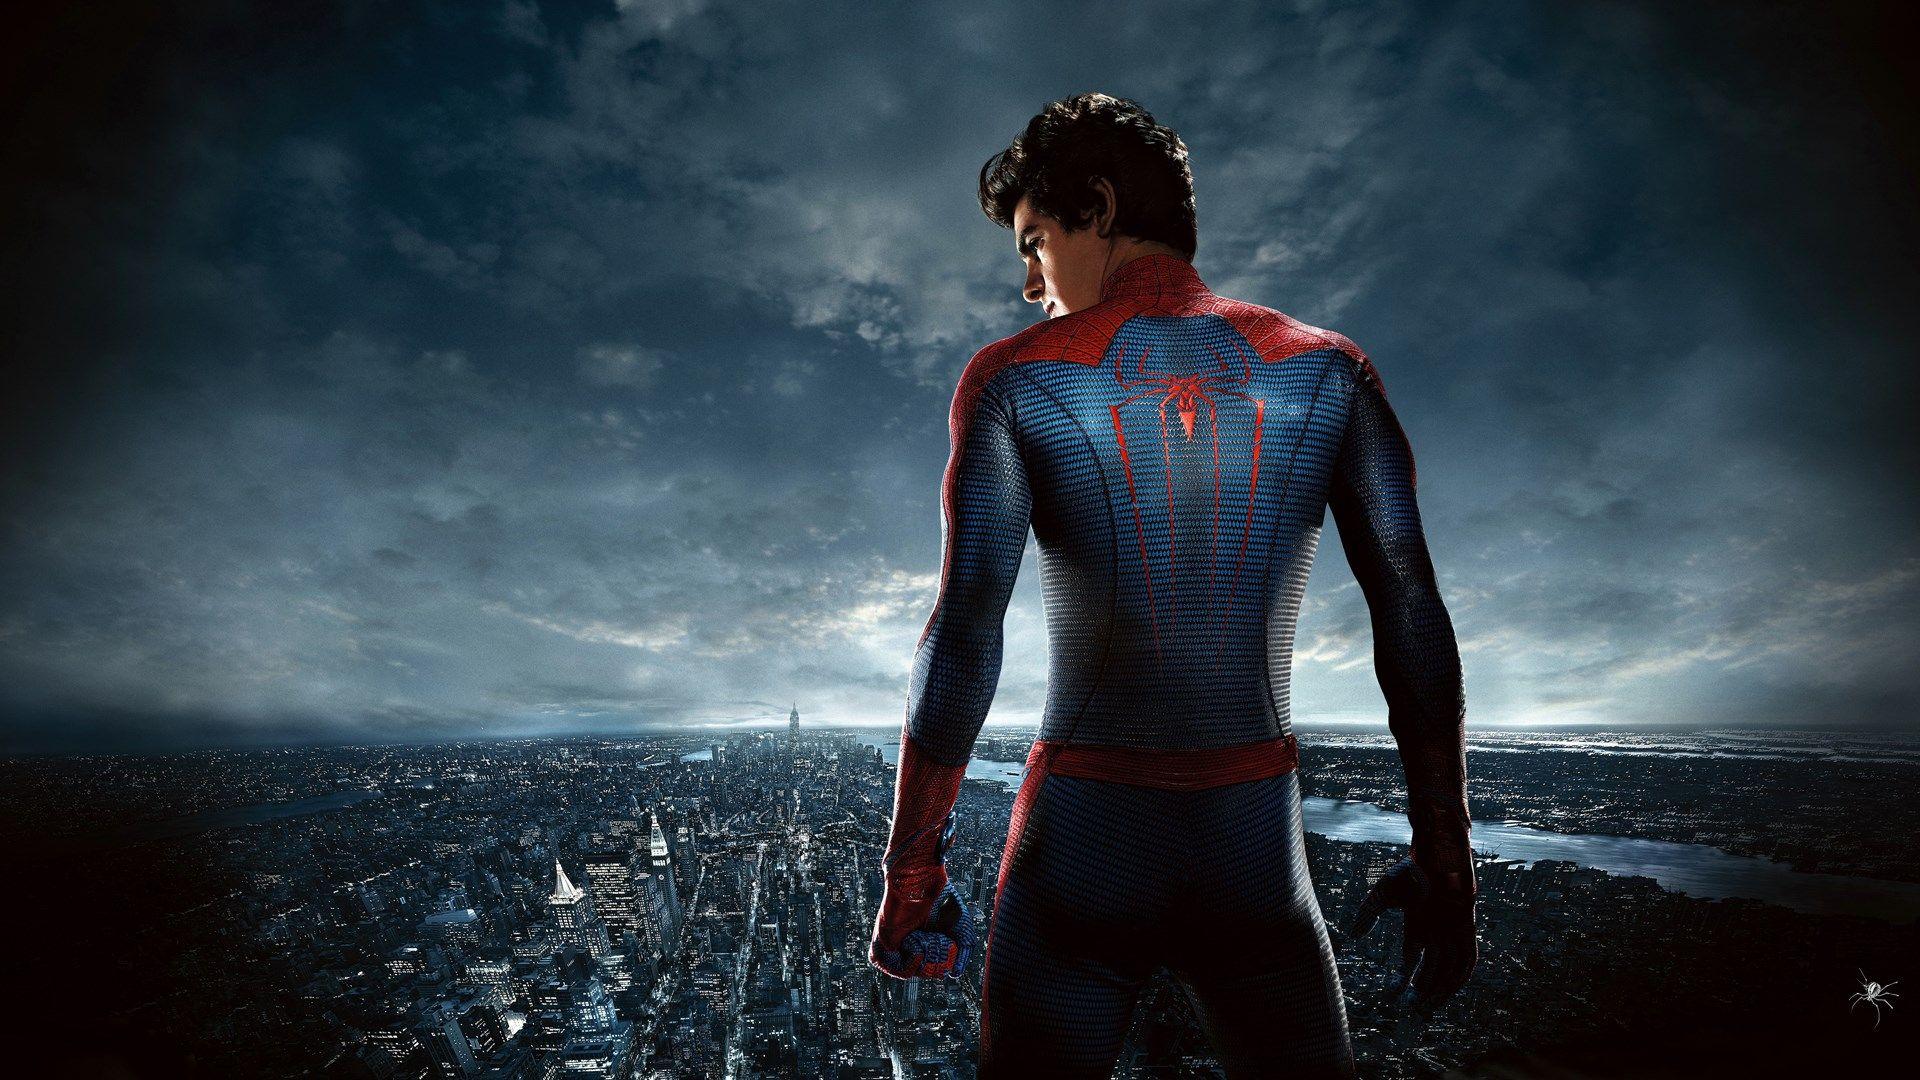 Spiderman Wallpaper Desktop Backgrounds Free Spiderman Superhelden Filme Peter Parker